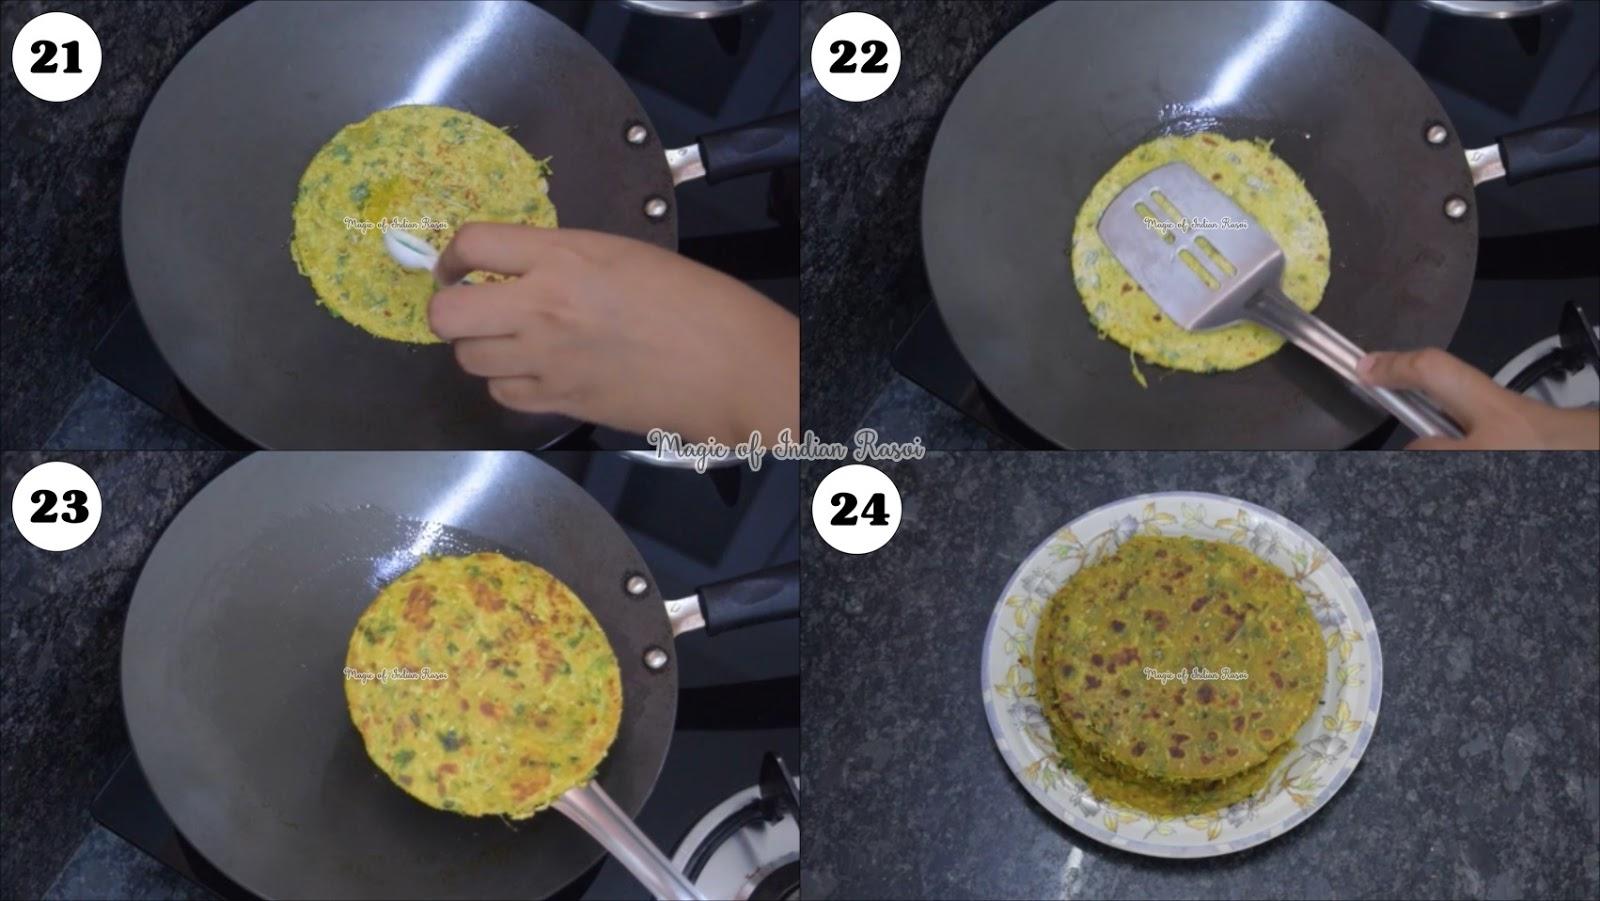 Dudhi Thepla Recipe - Lauki Paratha  - दूधीलौकी का थेपला रेसिपी - Priya R - Magic of Indian Rasoi